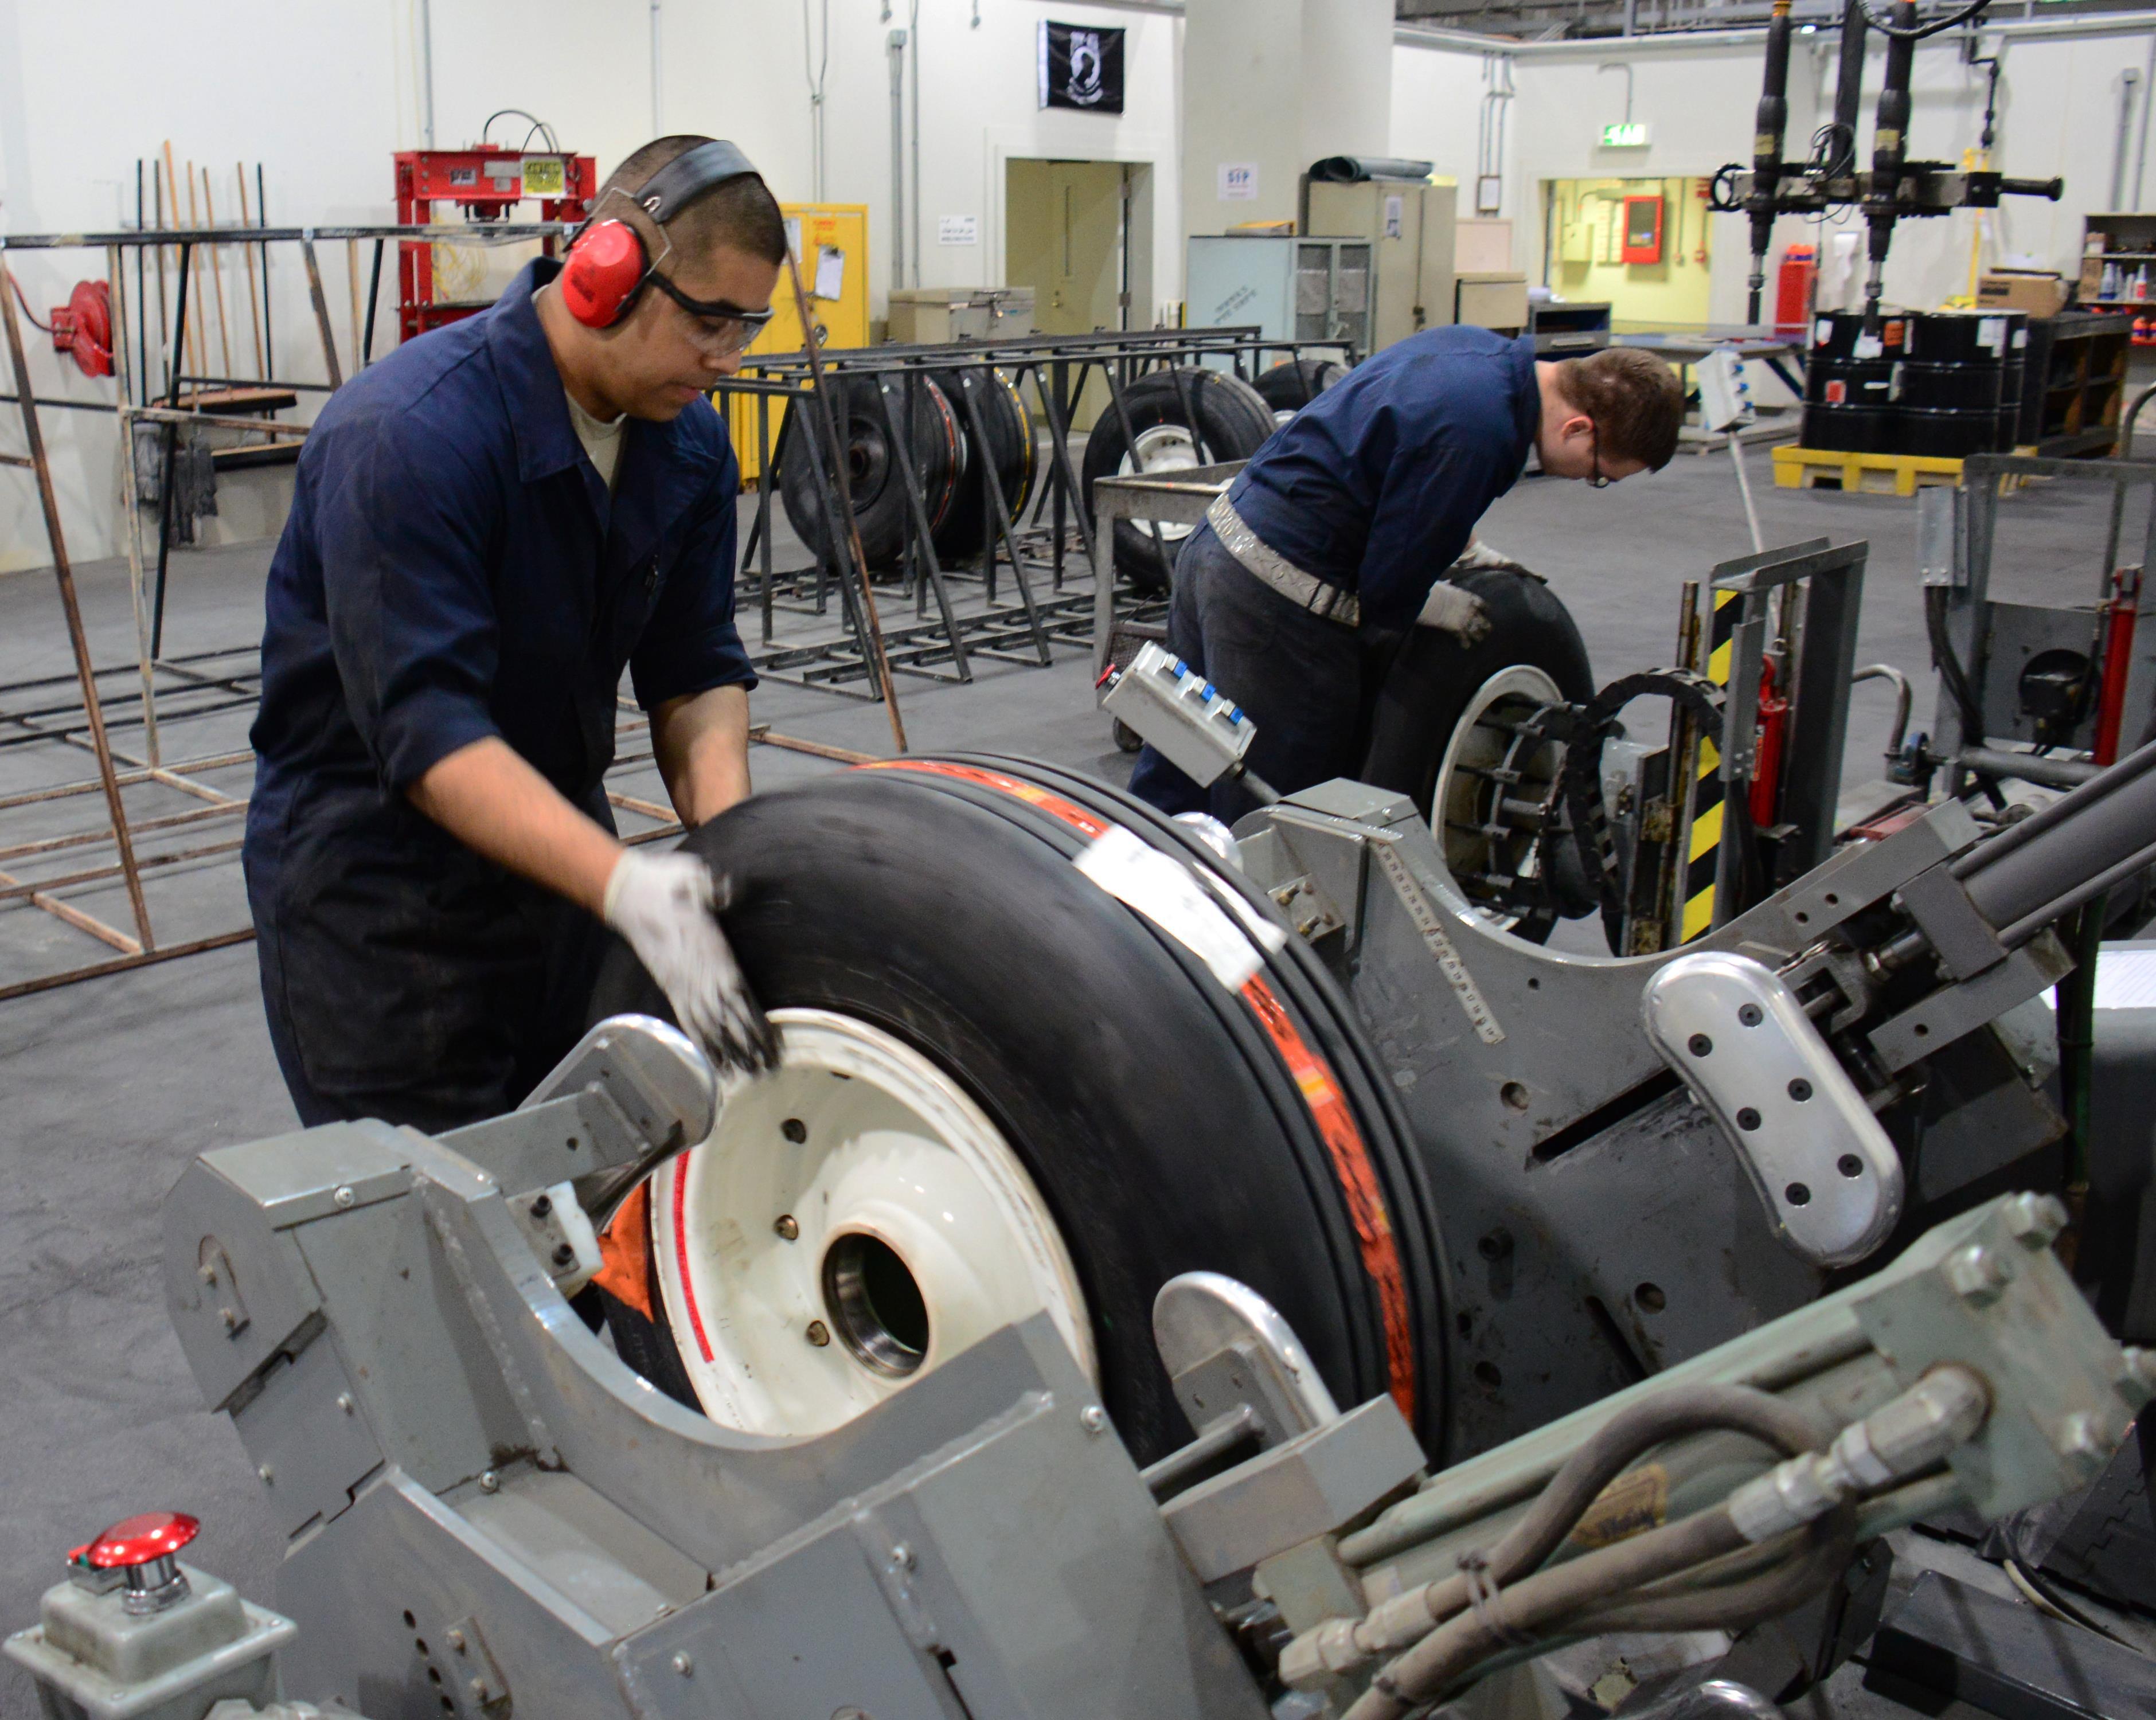 al udeid shop operates most productive wheel tire repair al udeid shop operates most productive wheel tire repair facility